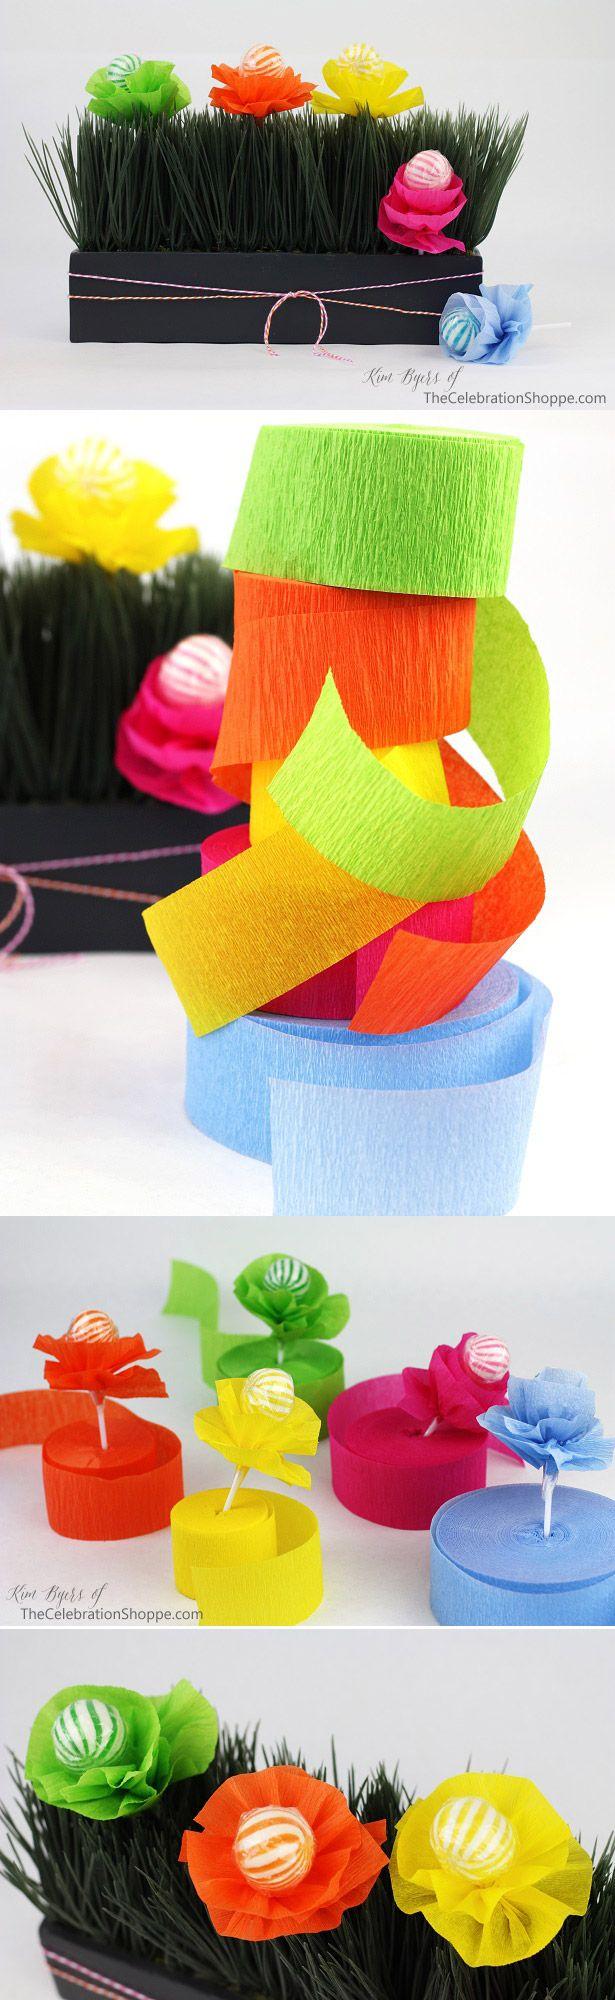 Crepe Paper Flower Lollipop Favor Tutorial | Kim Byers, TheCelebrationShoppe.com